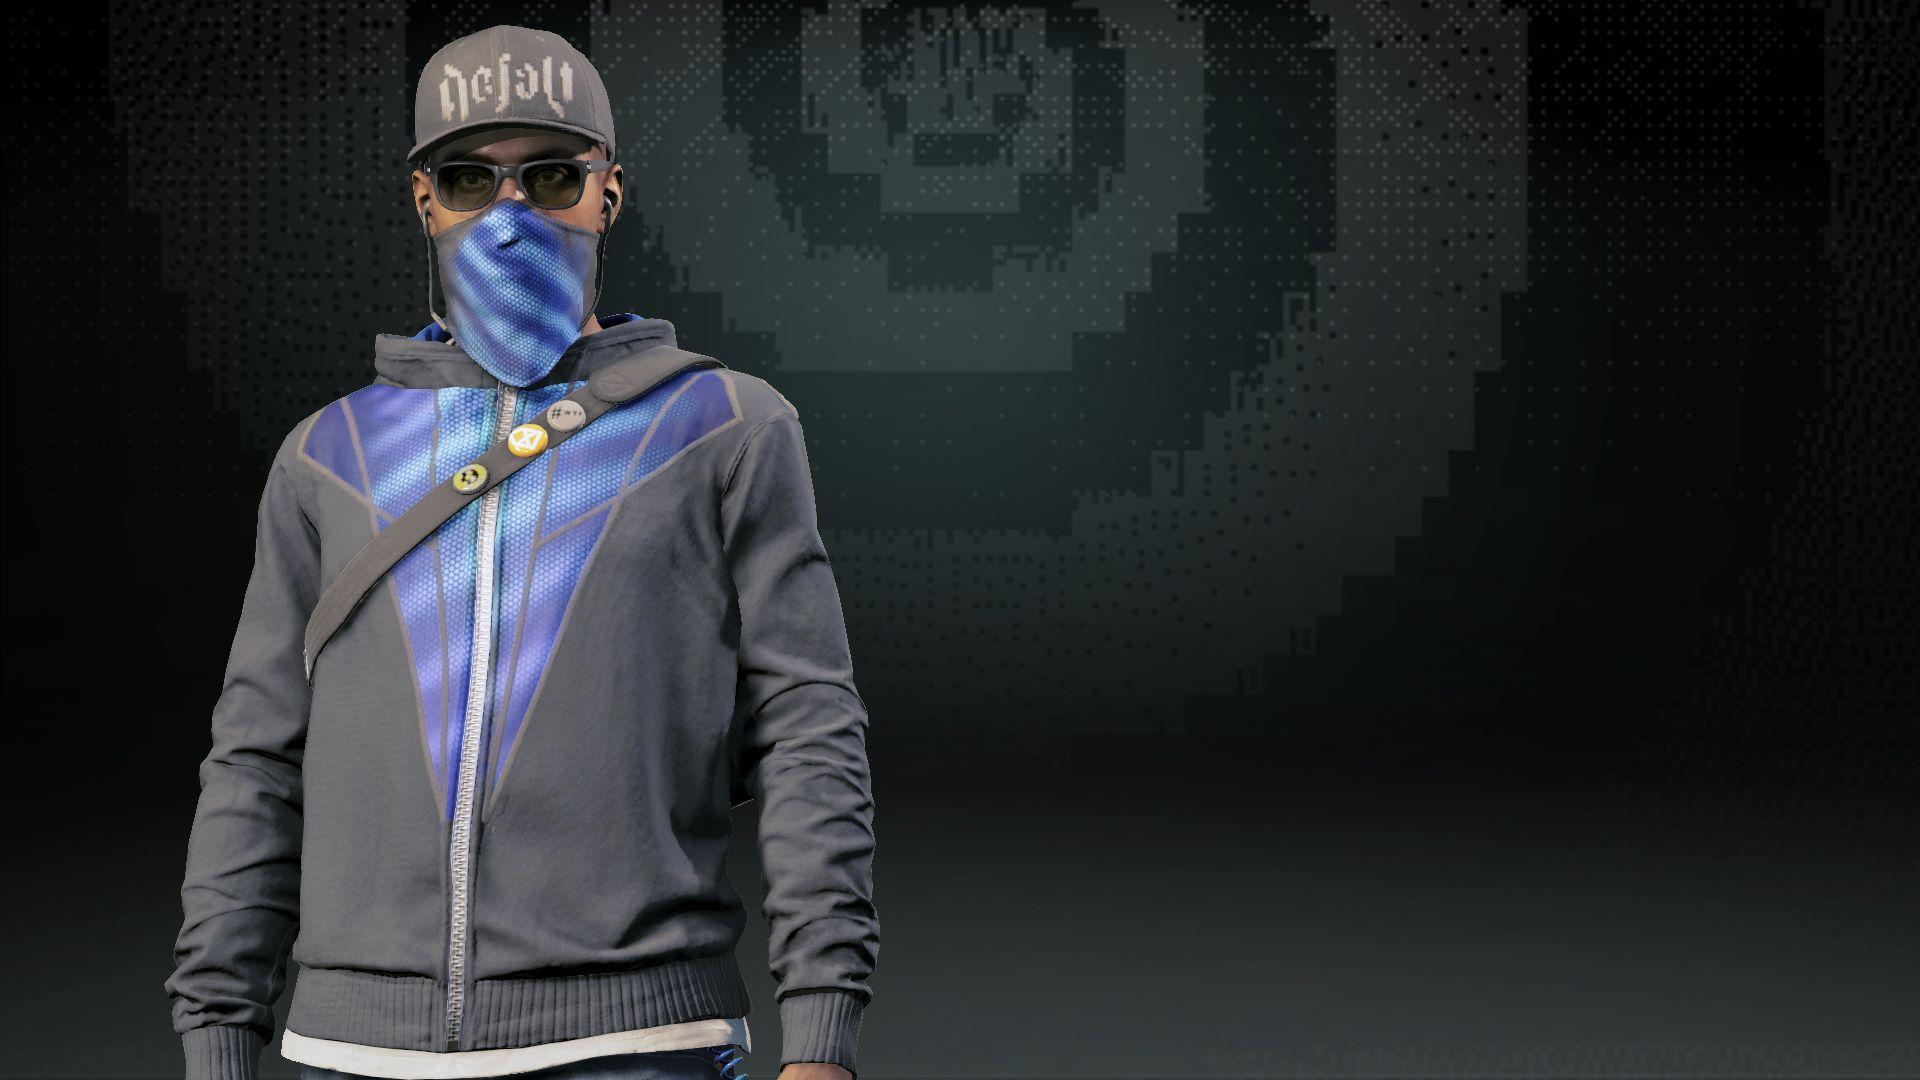 Watch Dogs 2 Defalt Anzug Kaufen Microsoft Store De De